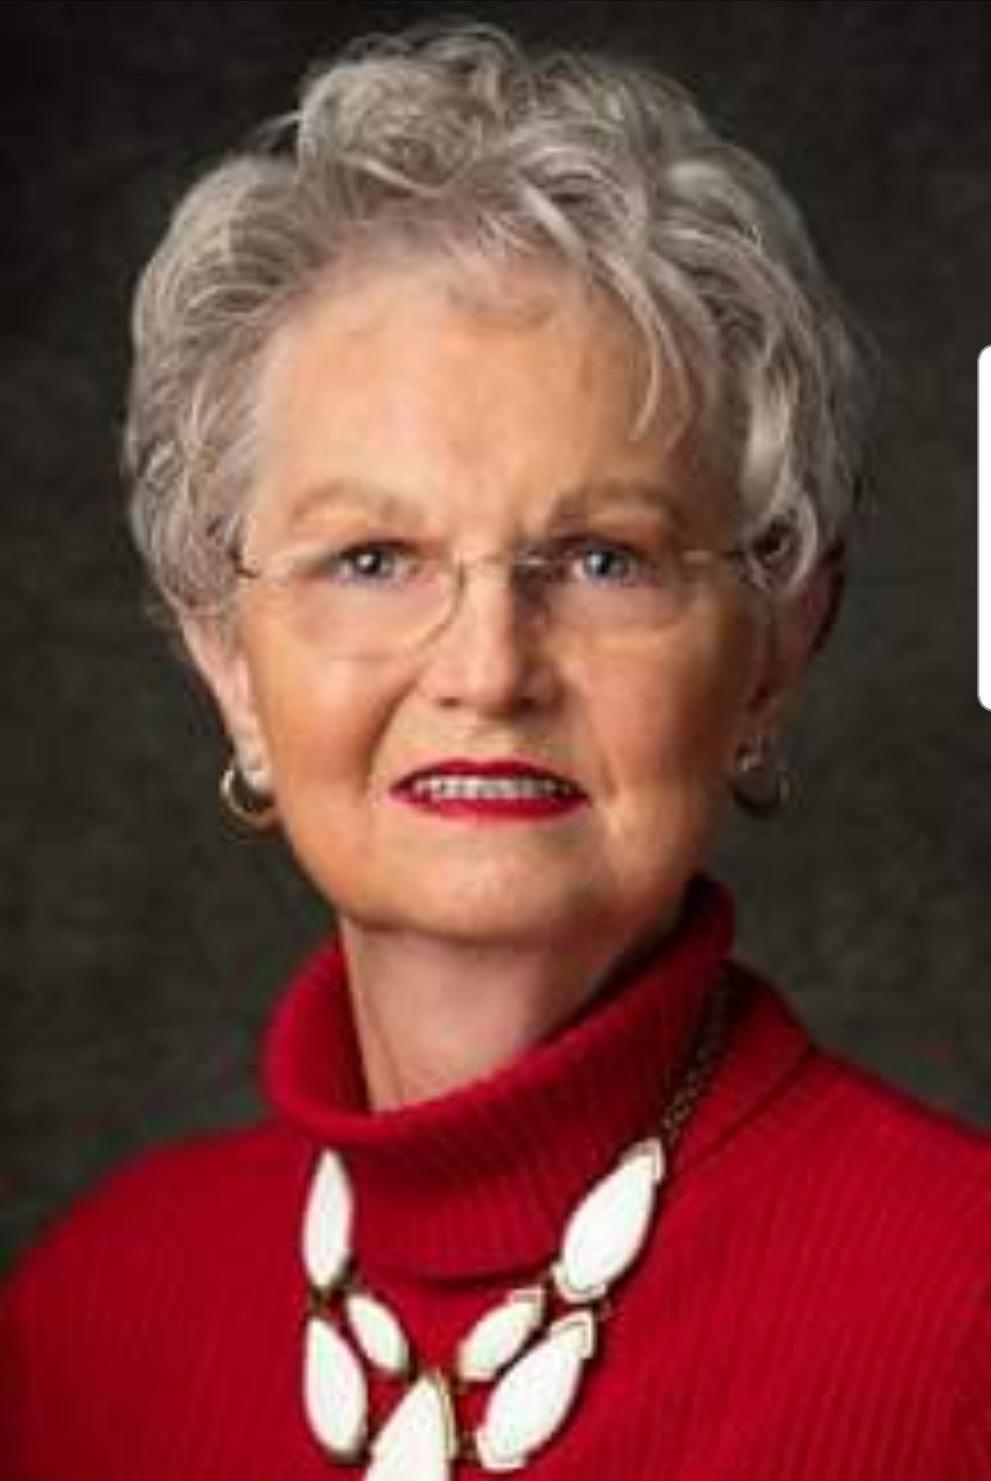 M. Sharon Malcolm Obituary